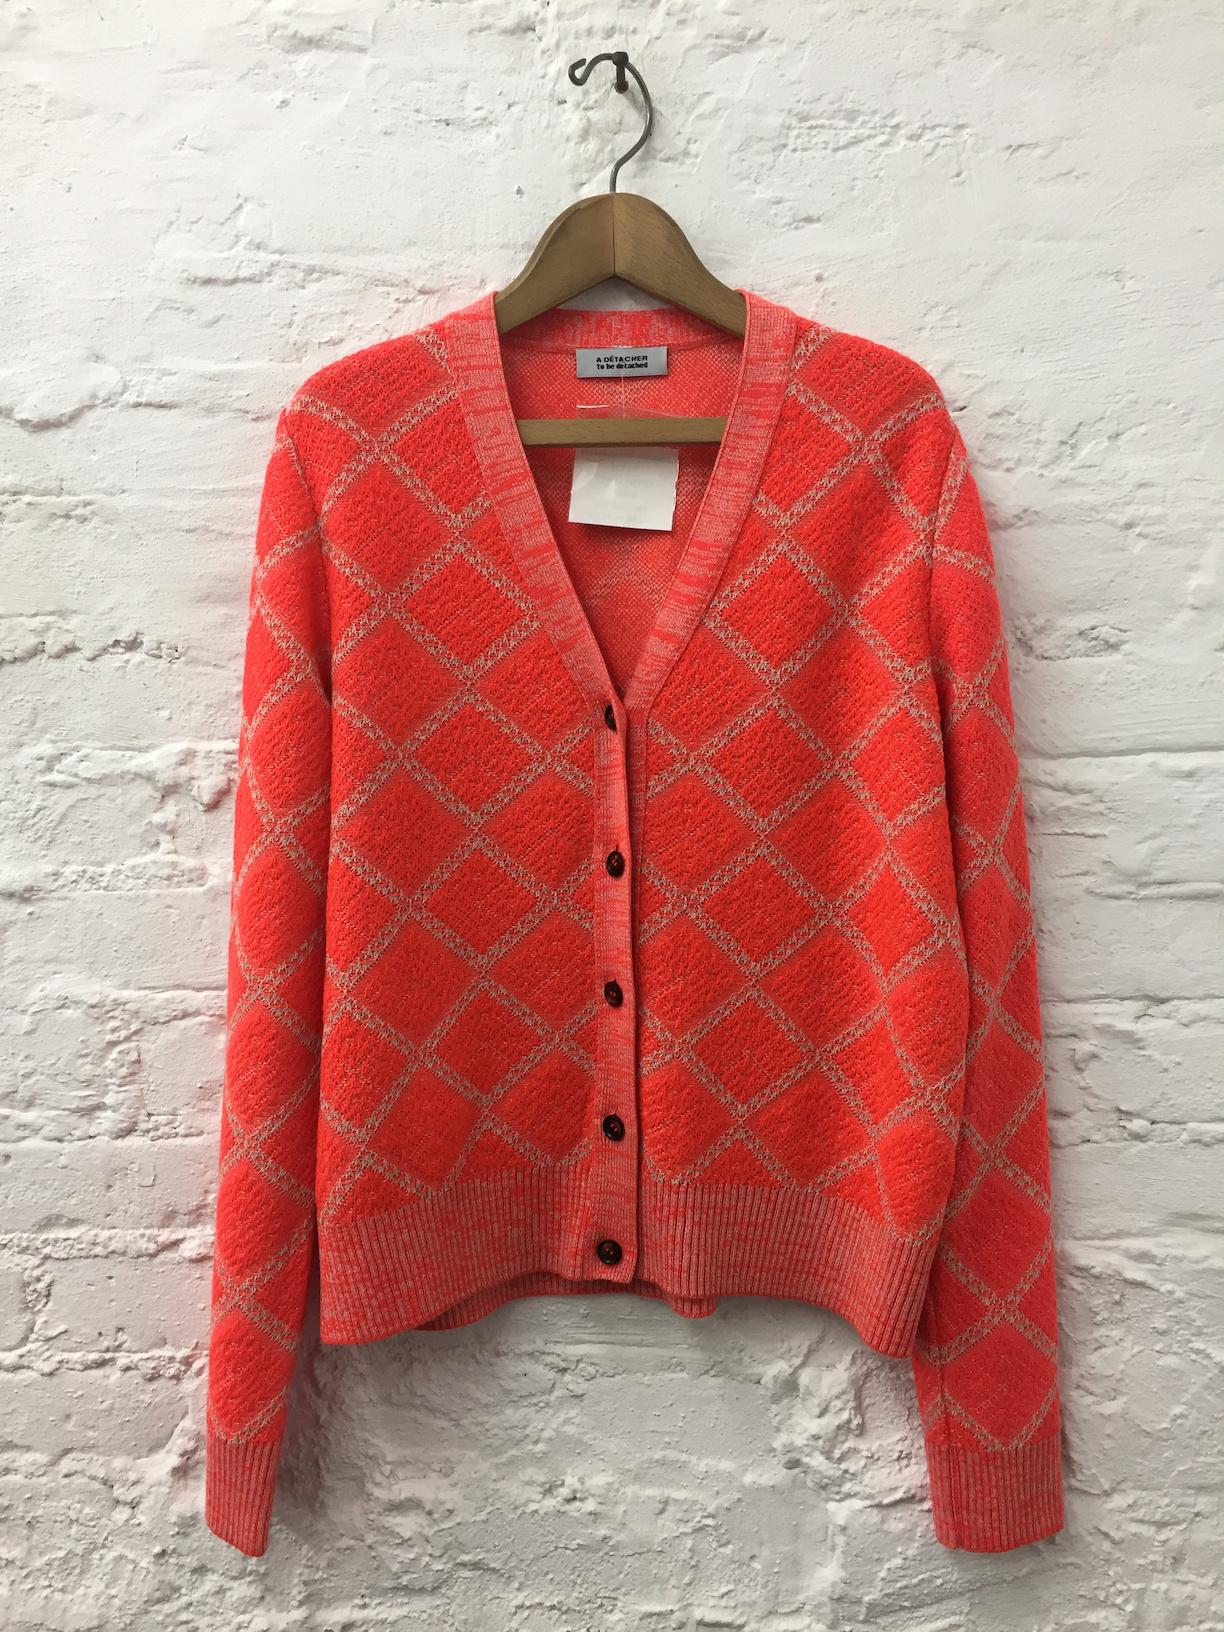 A Détacher Claudeta Cardigan, Red Fluo, Argyle V Neck Cardigan Sweater